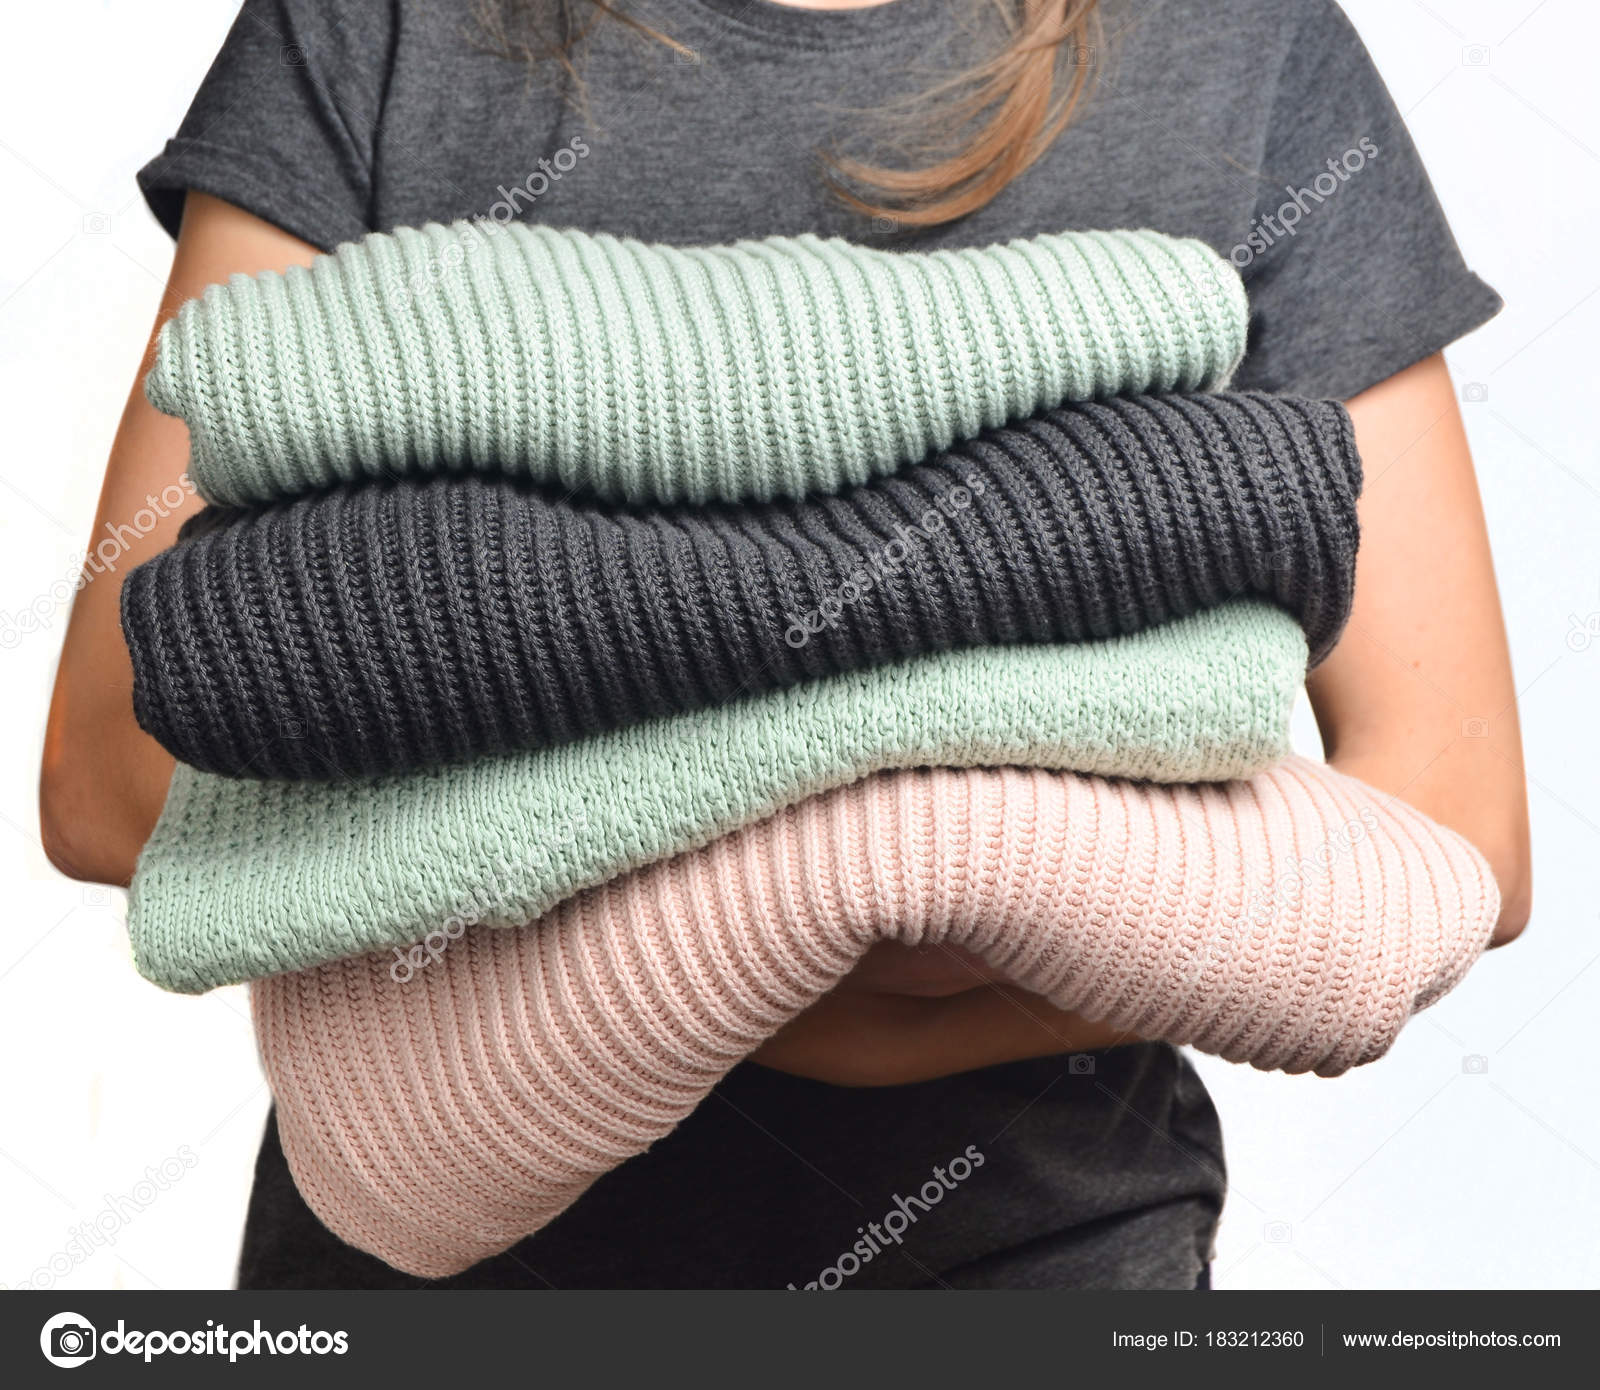 82eef213f1c3 Μια στοίβα των πουλόβερ σε γυναικεία χέρια που απομονώνονται σε λευκό φόντο  — Εικόνα από split271992.gmail.com